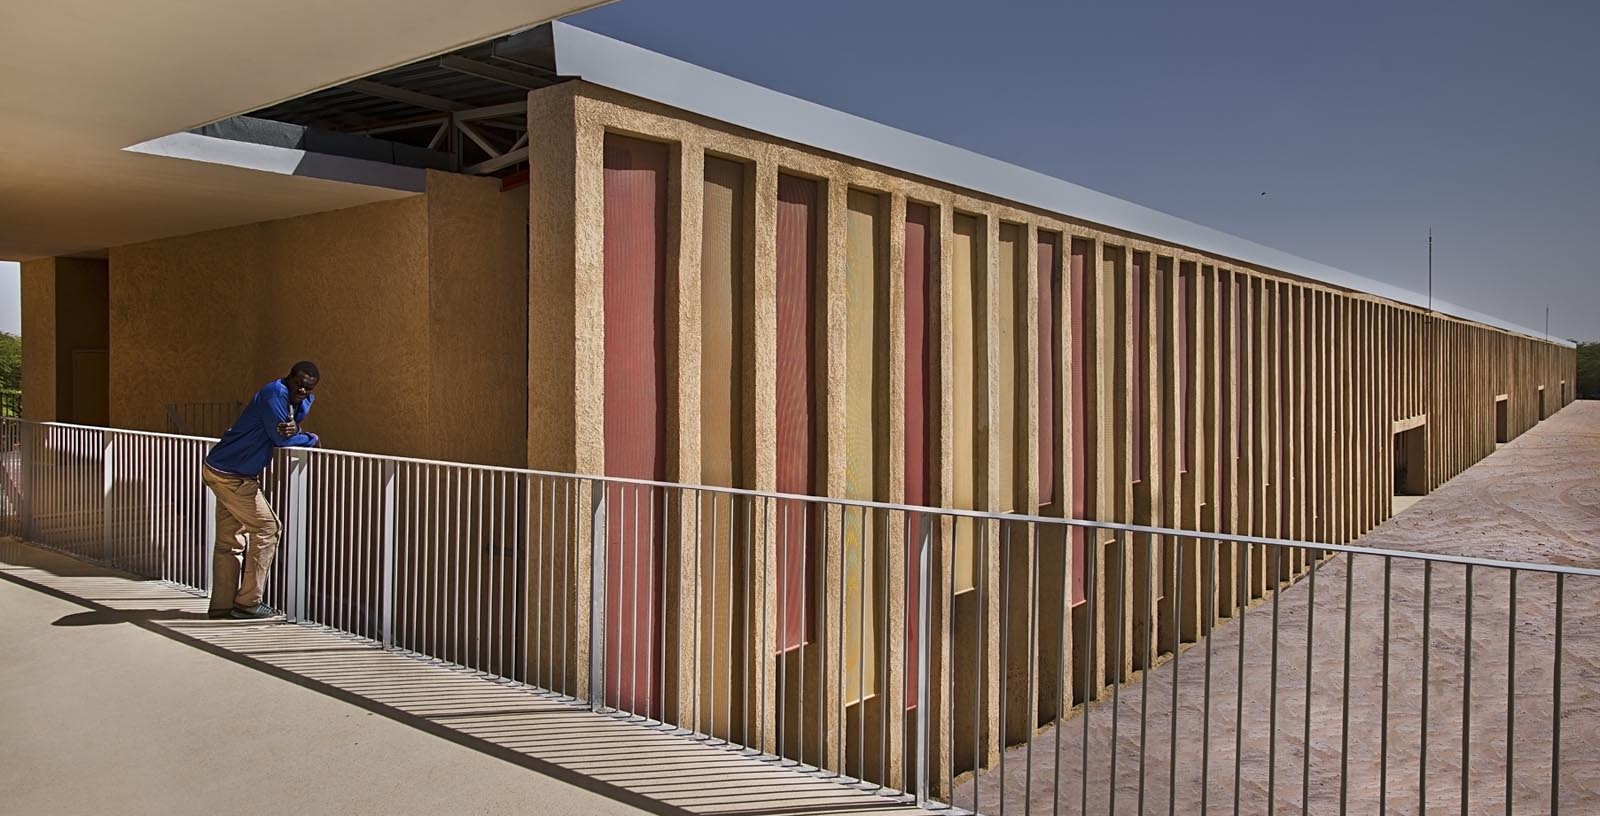 Saint_Louis-University-4-Architecture-IDOM-copyright-Francesco-Pinton